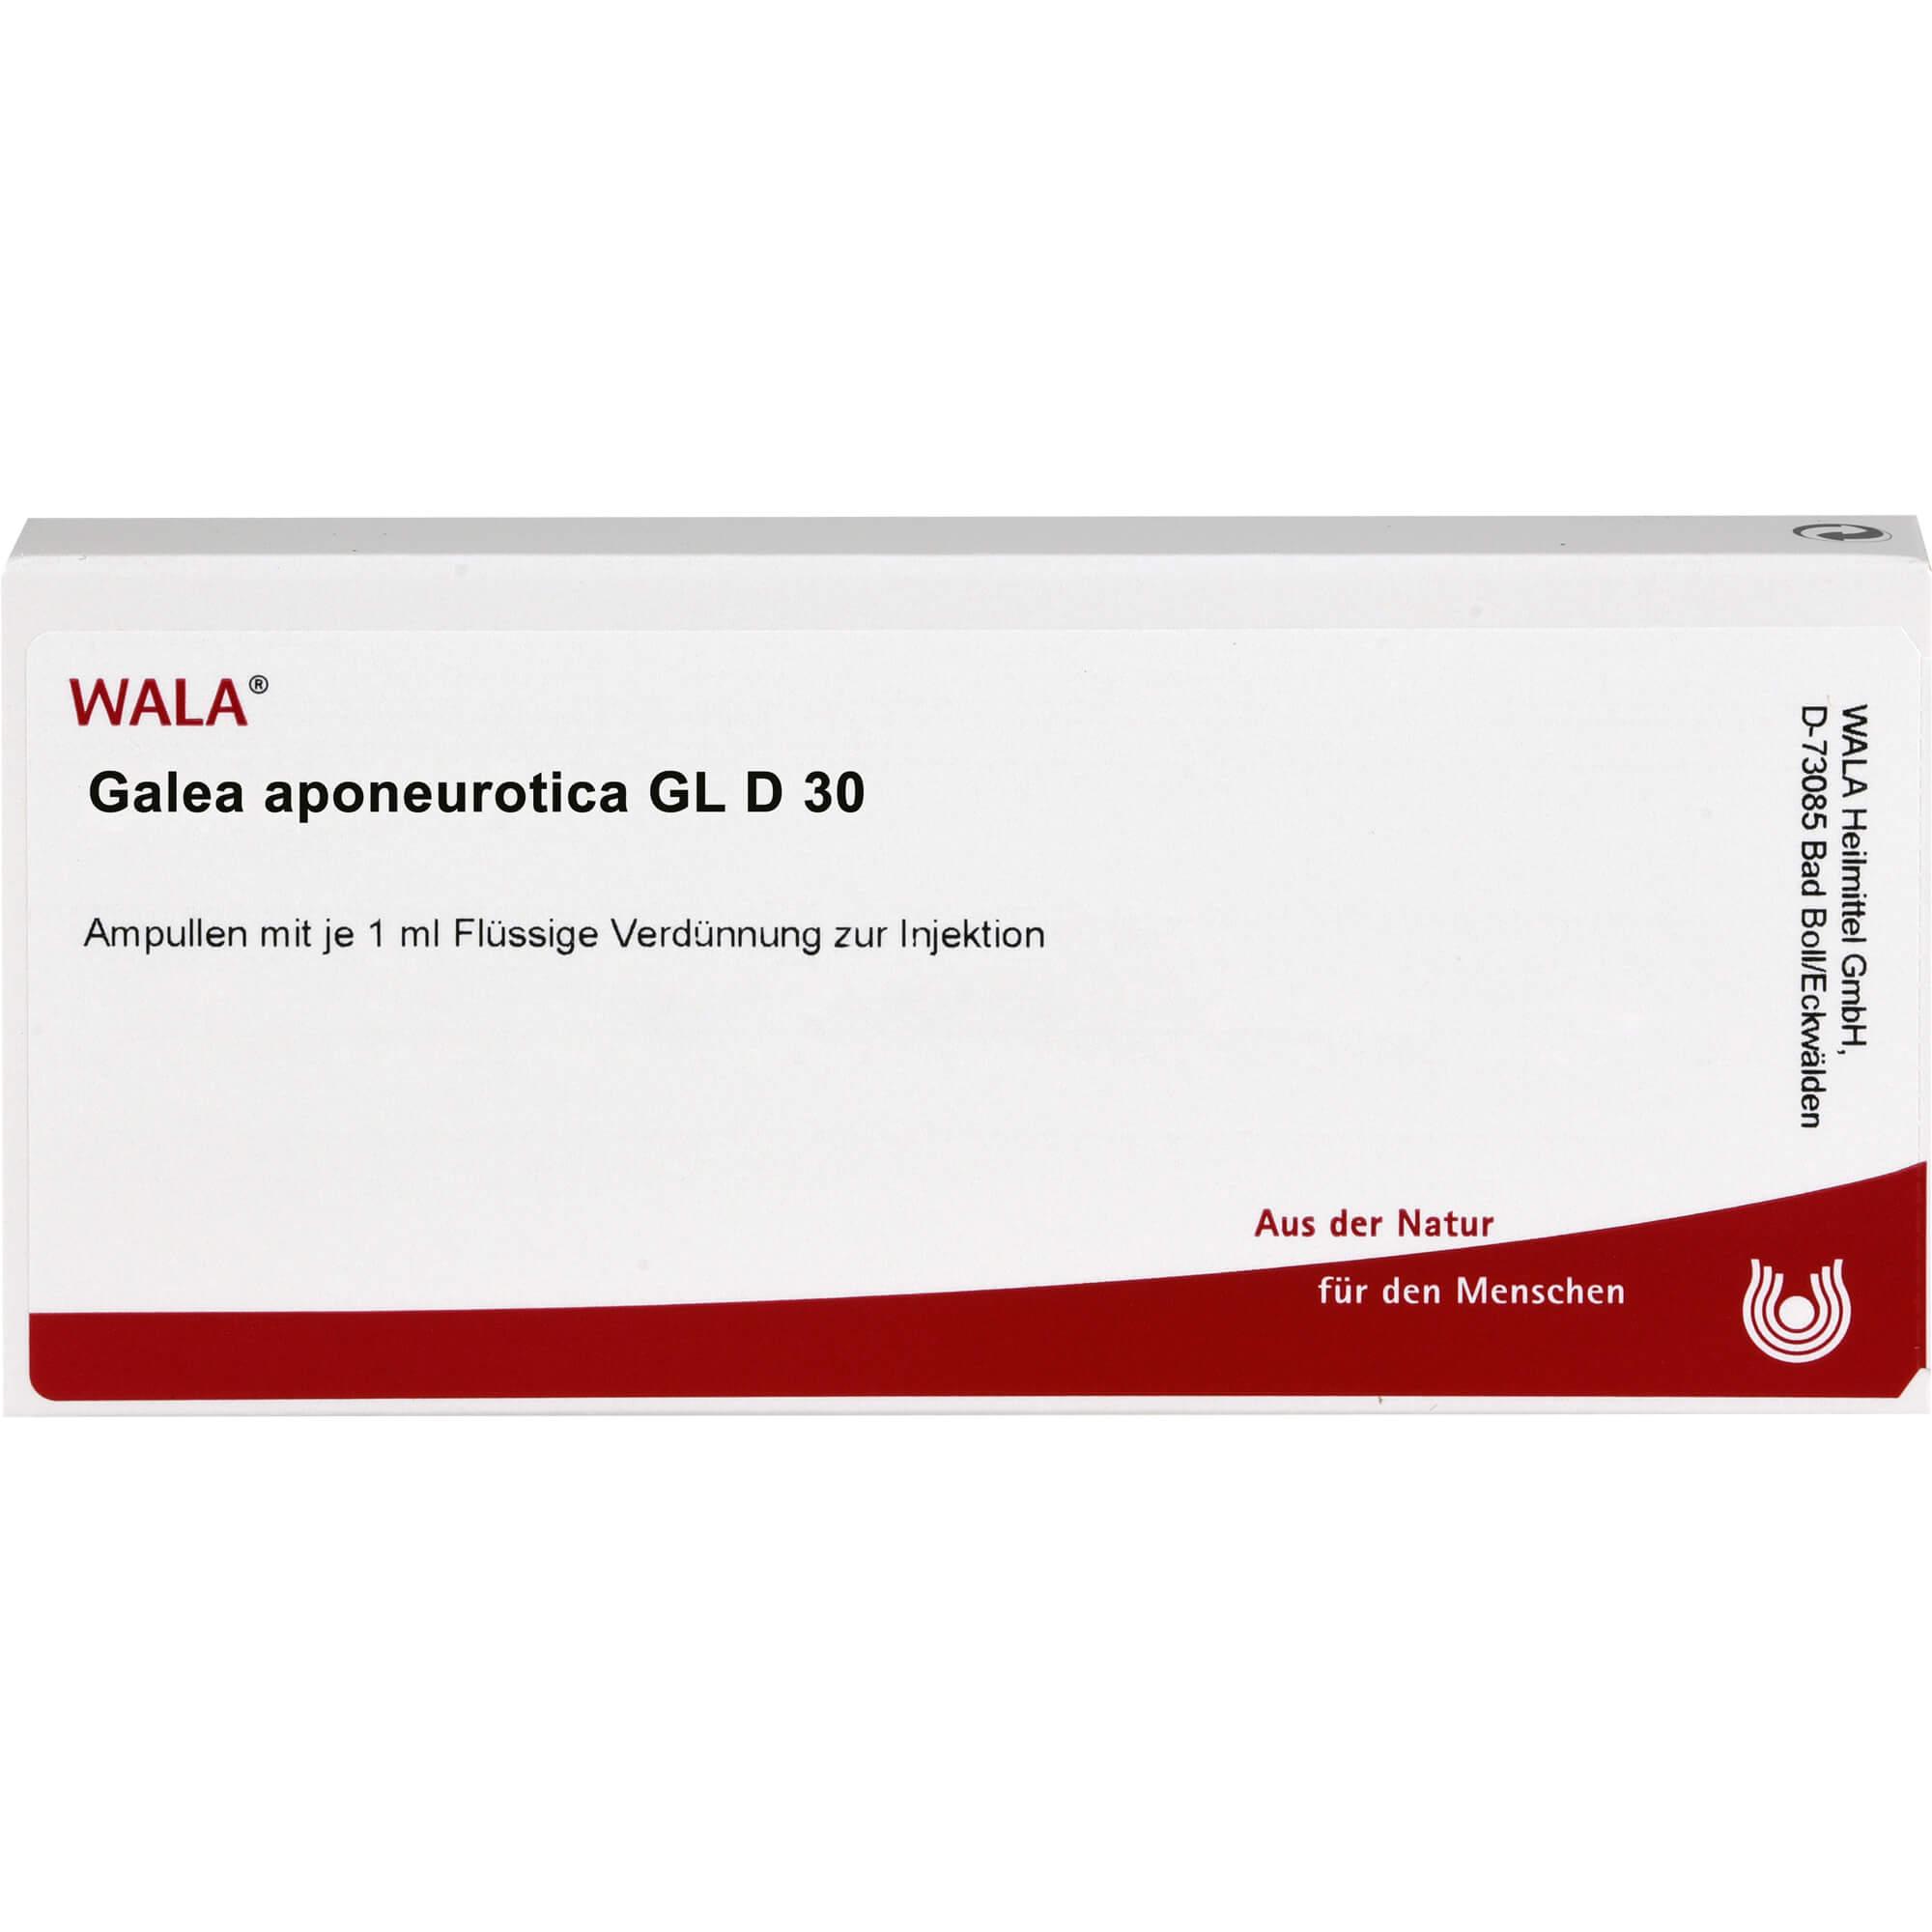 GALEA aponeurotica GL D 30 Ampullen